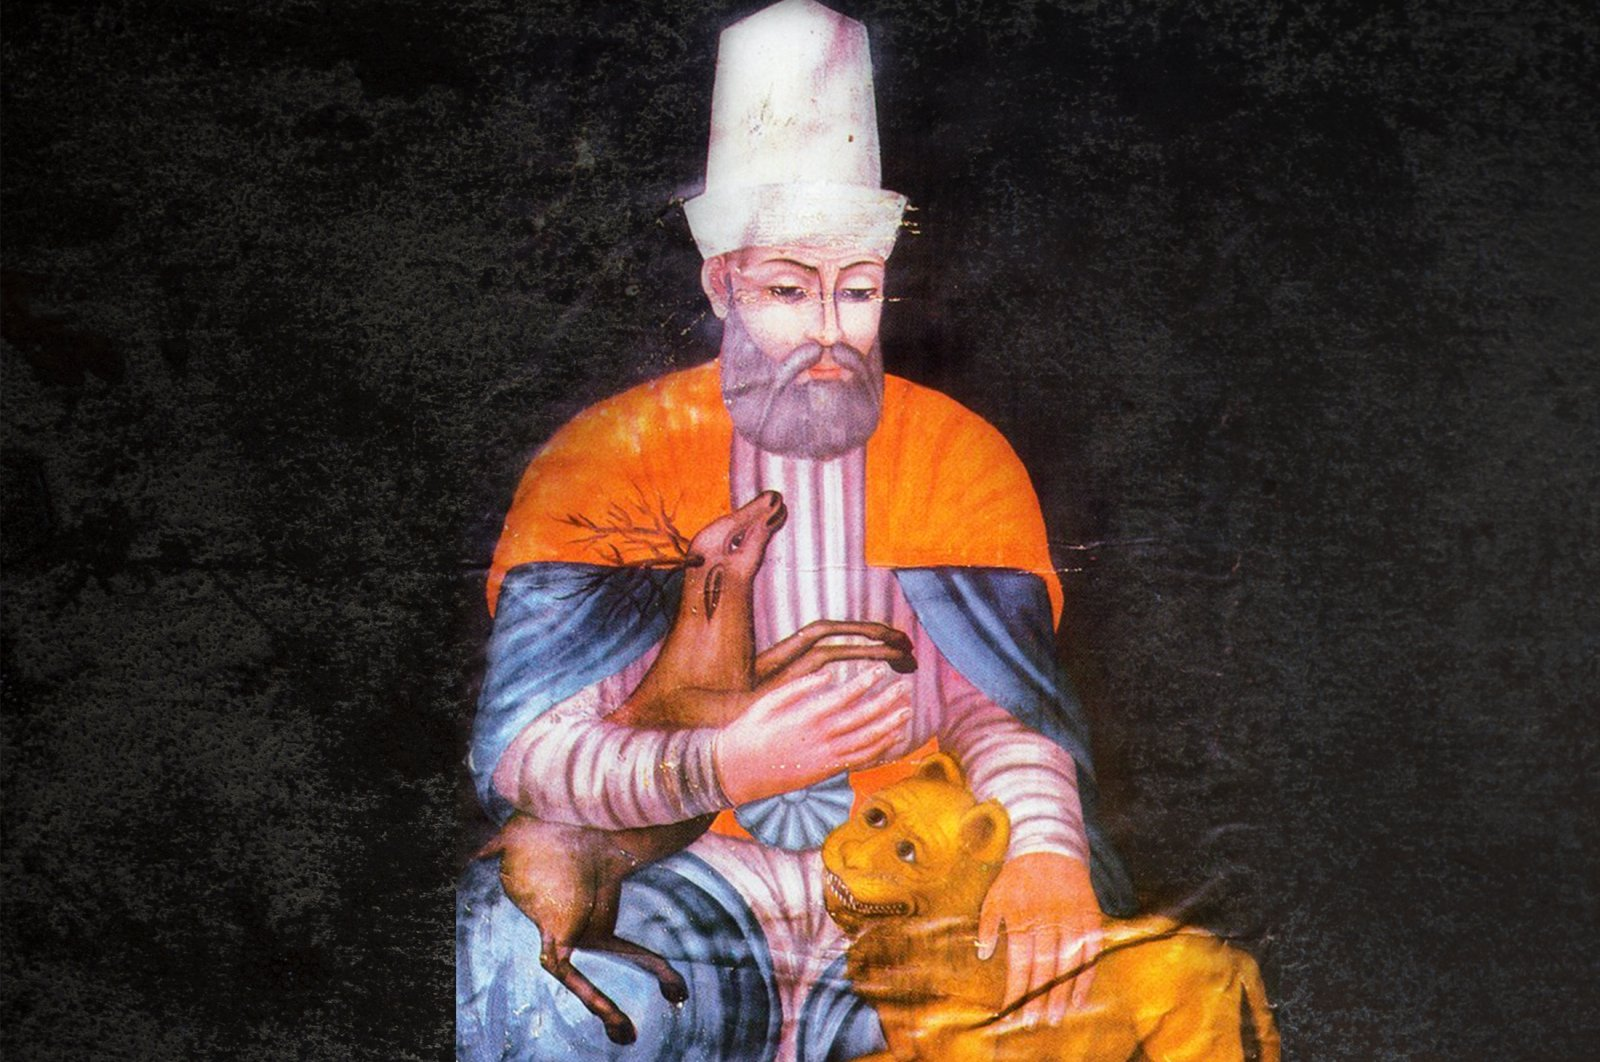 A general depiction of Haji Bektash Veli, holding a deer and a lion.